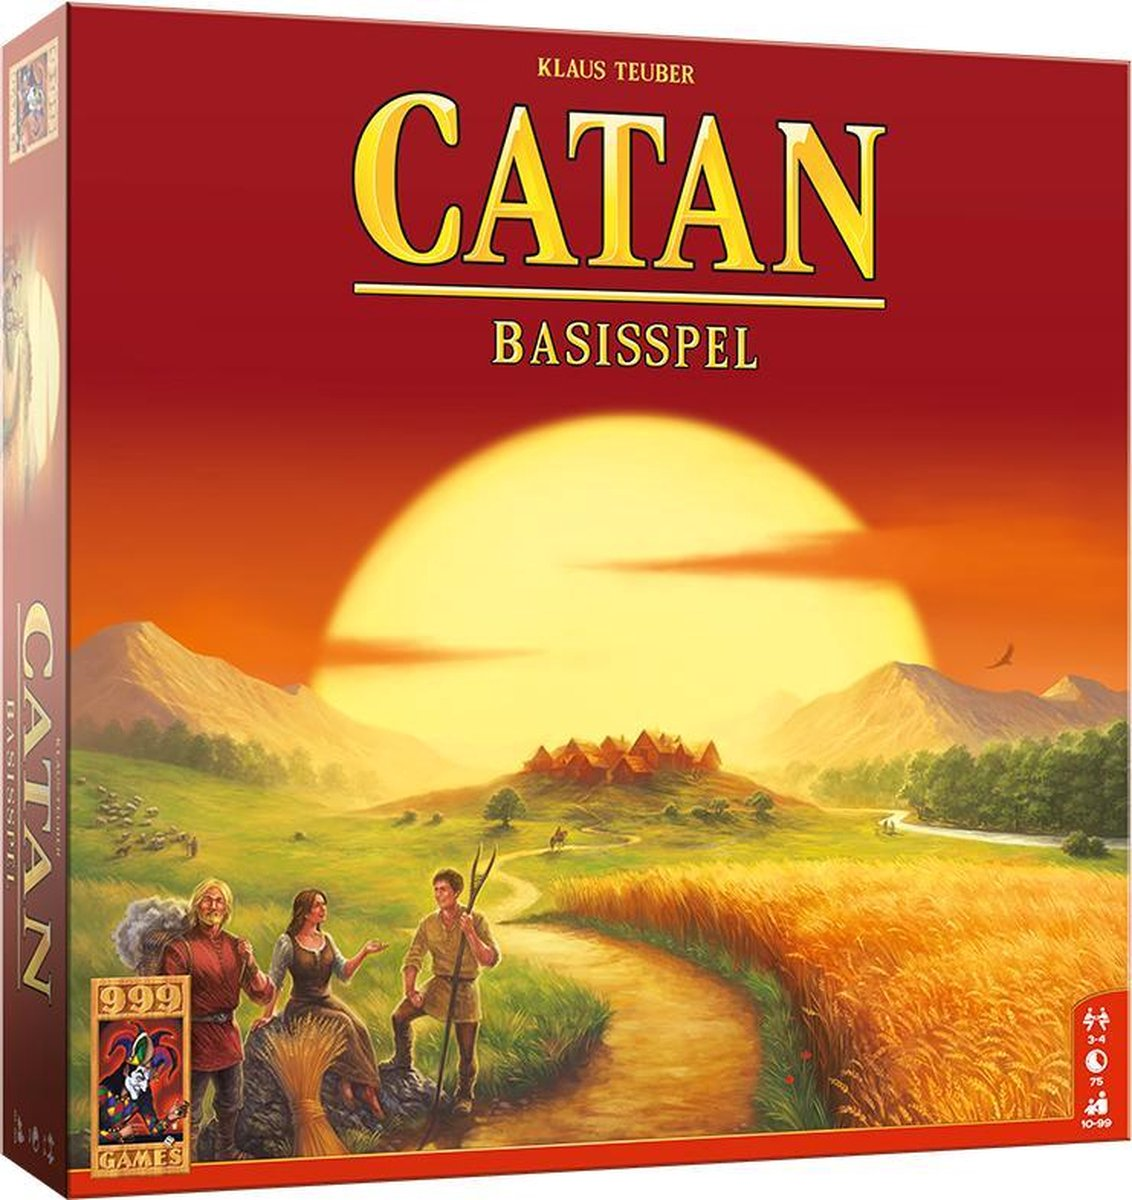 Catan - Basisspel